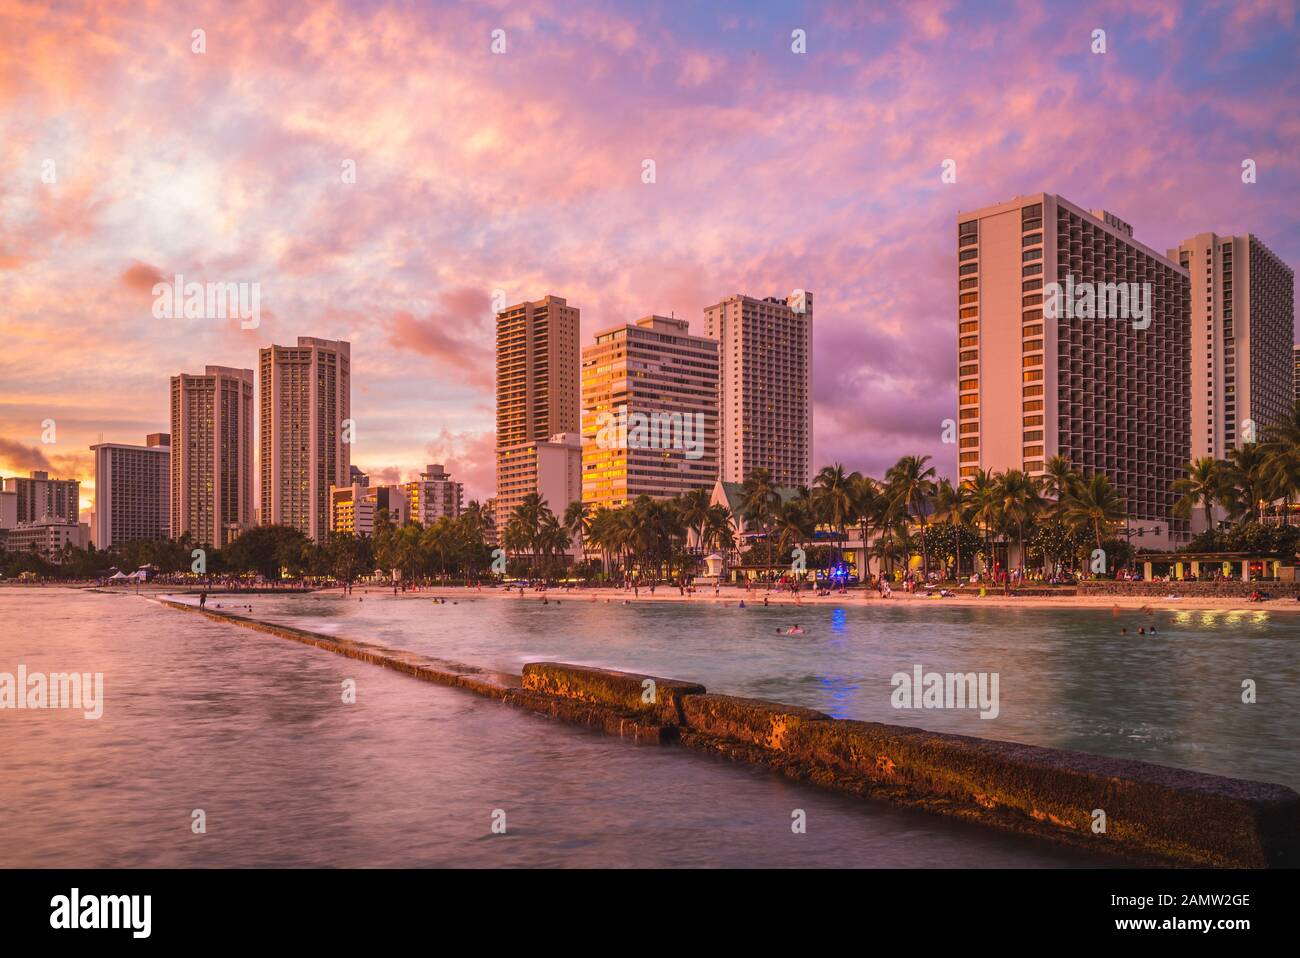 Skyline of Honolulu at Waikiki beach, Hawaii, US Stock Photo